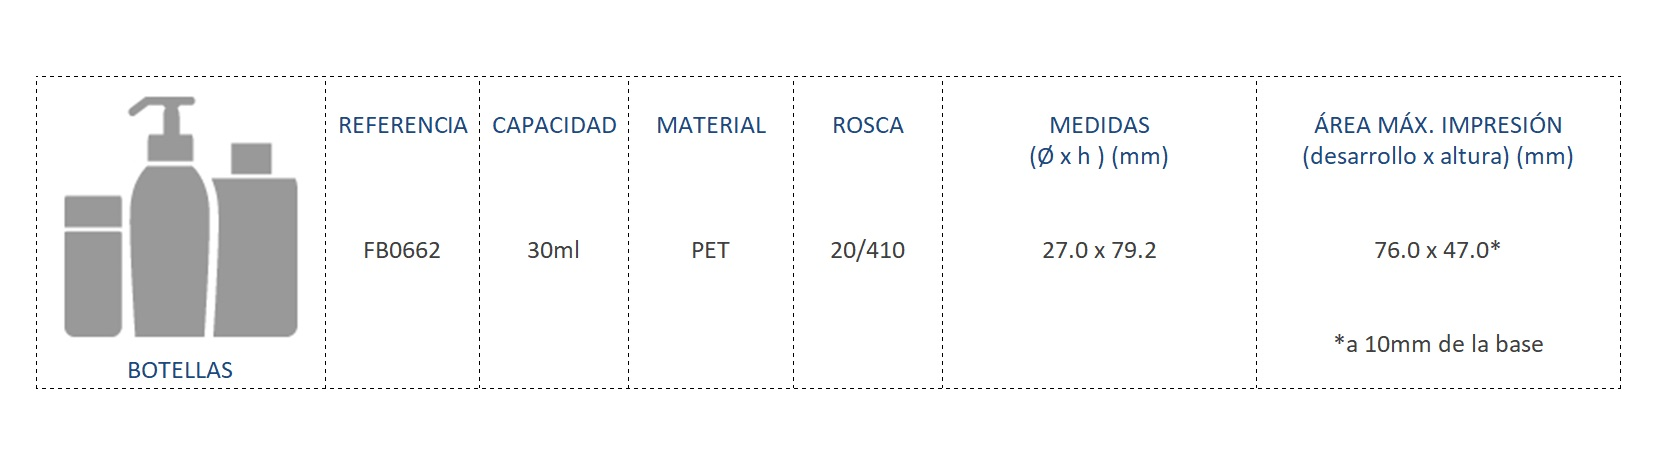 Cuadro de materiales FB0662